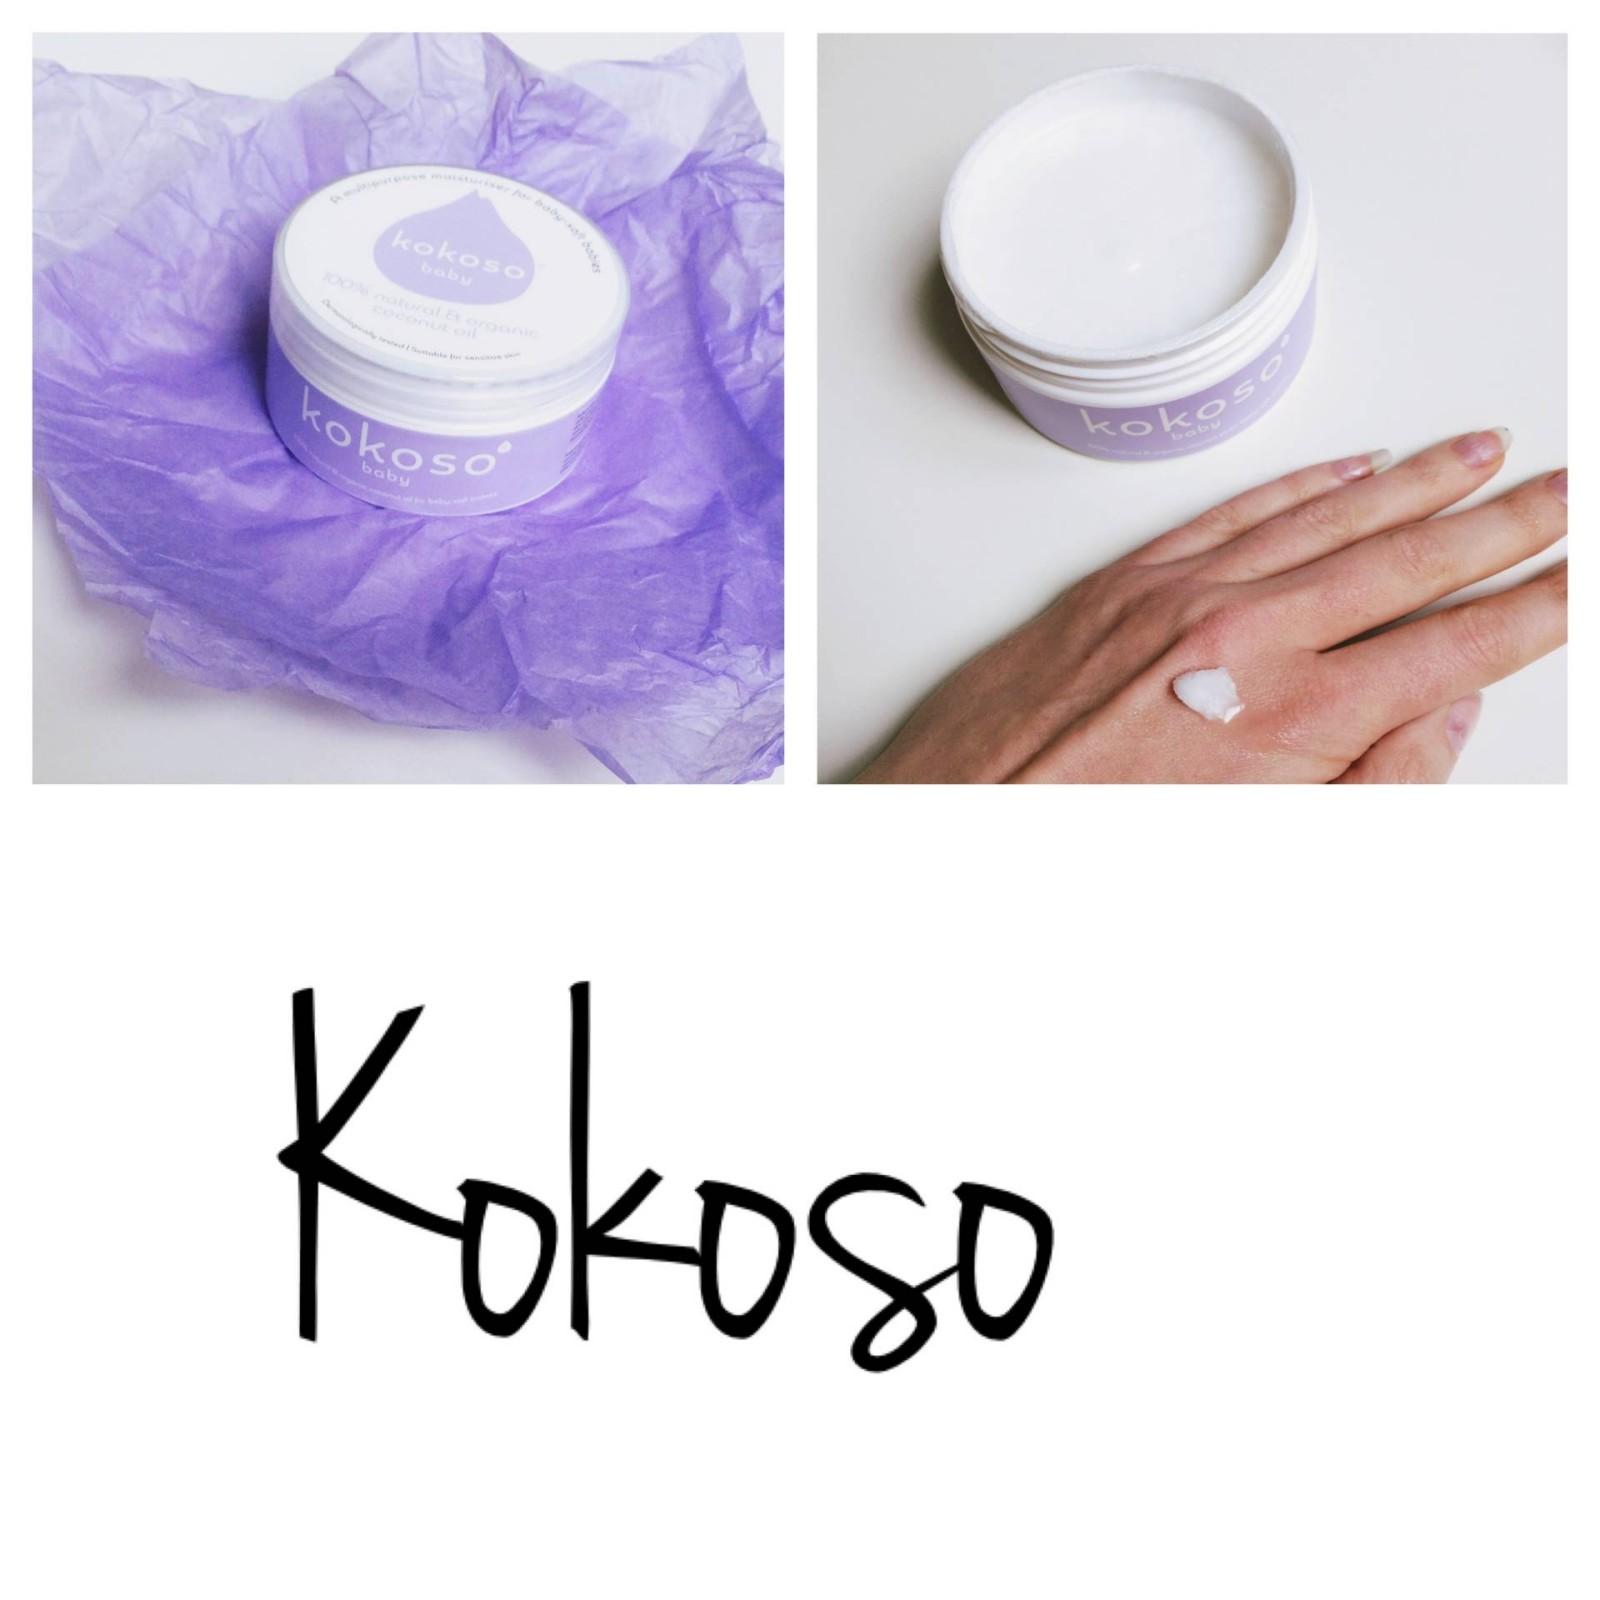 kokoso review